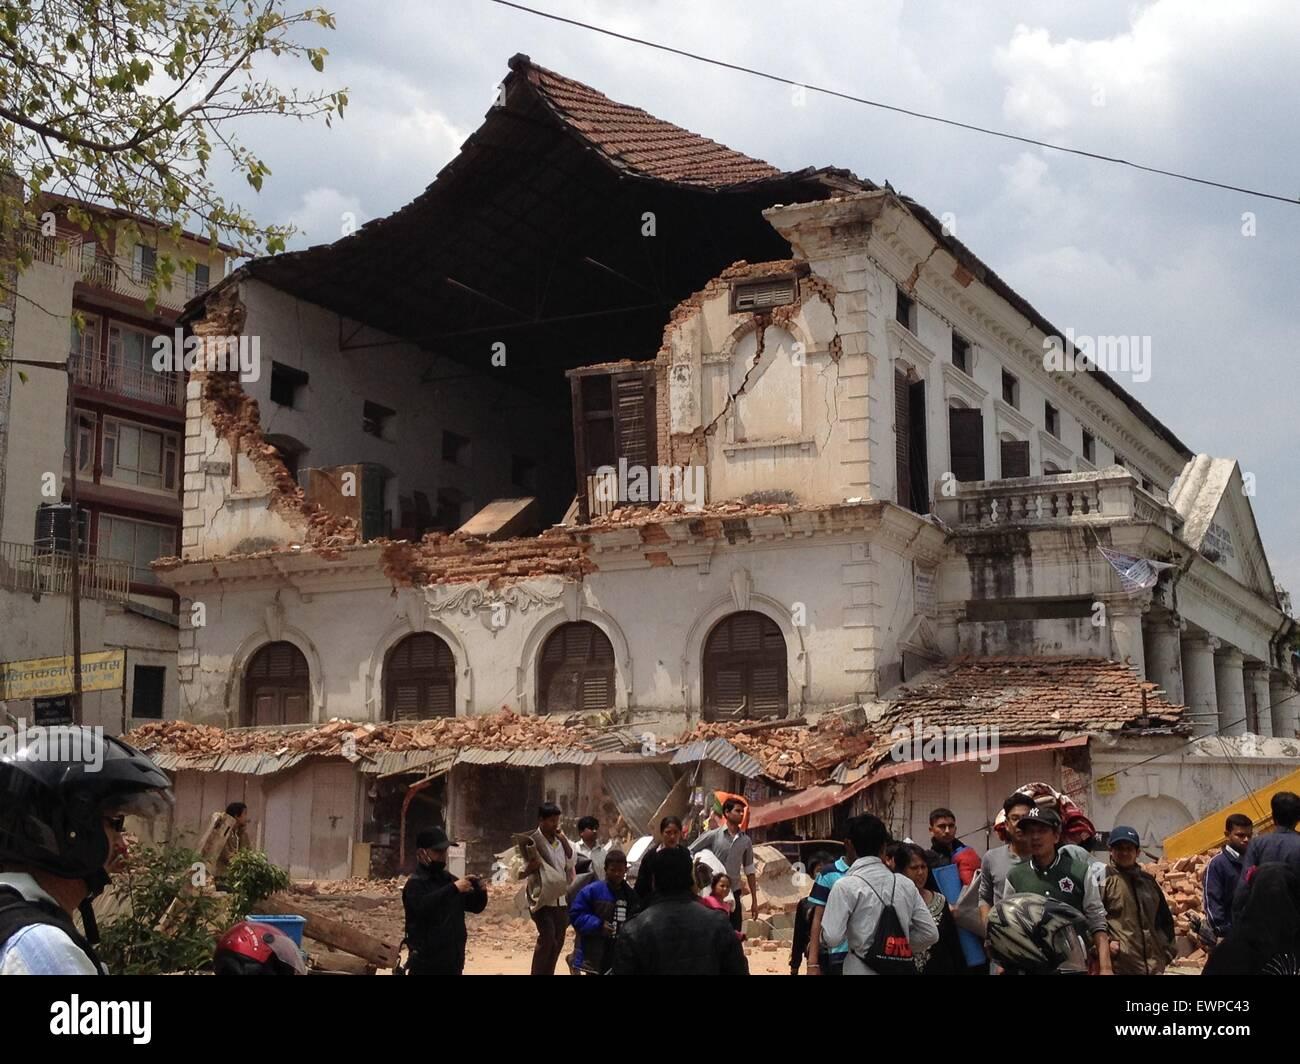 Kathmandu Durbar High School Collapsed After The